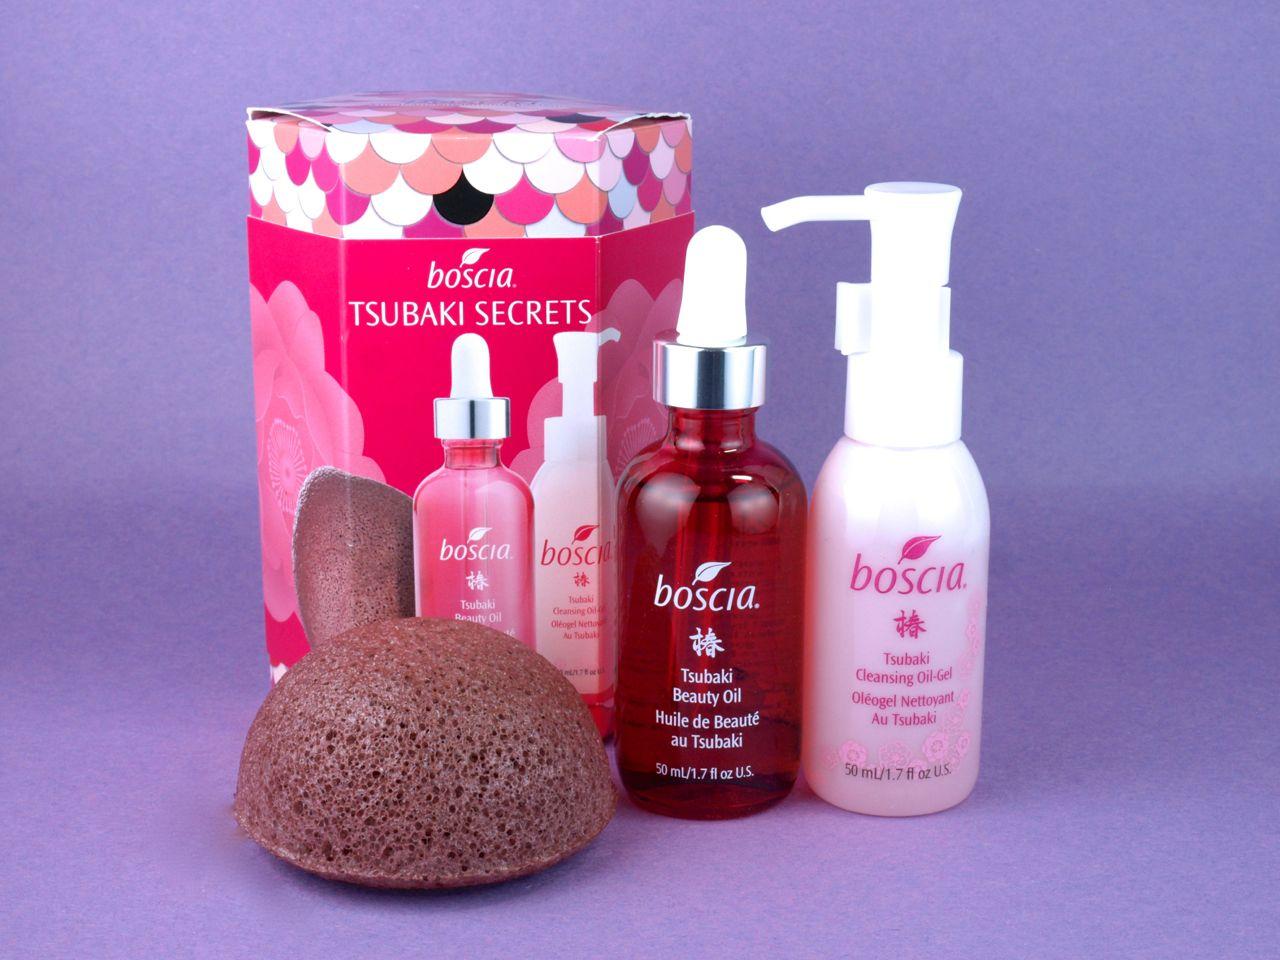 Boscia Tsubaki Secrets Gift Set: Review